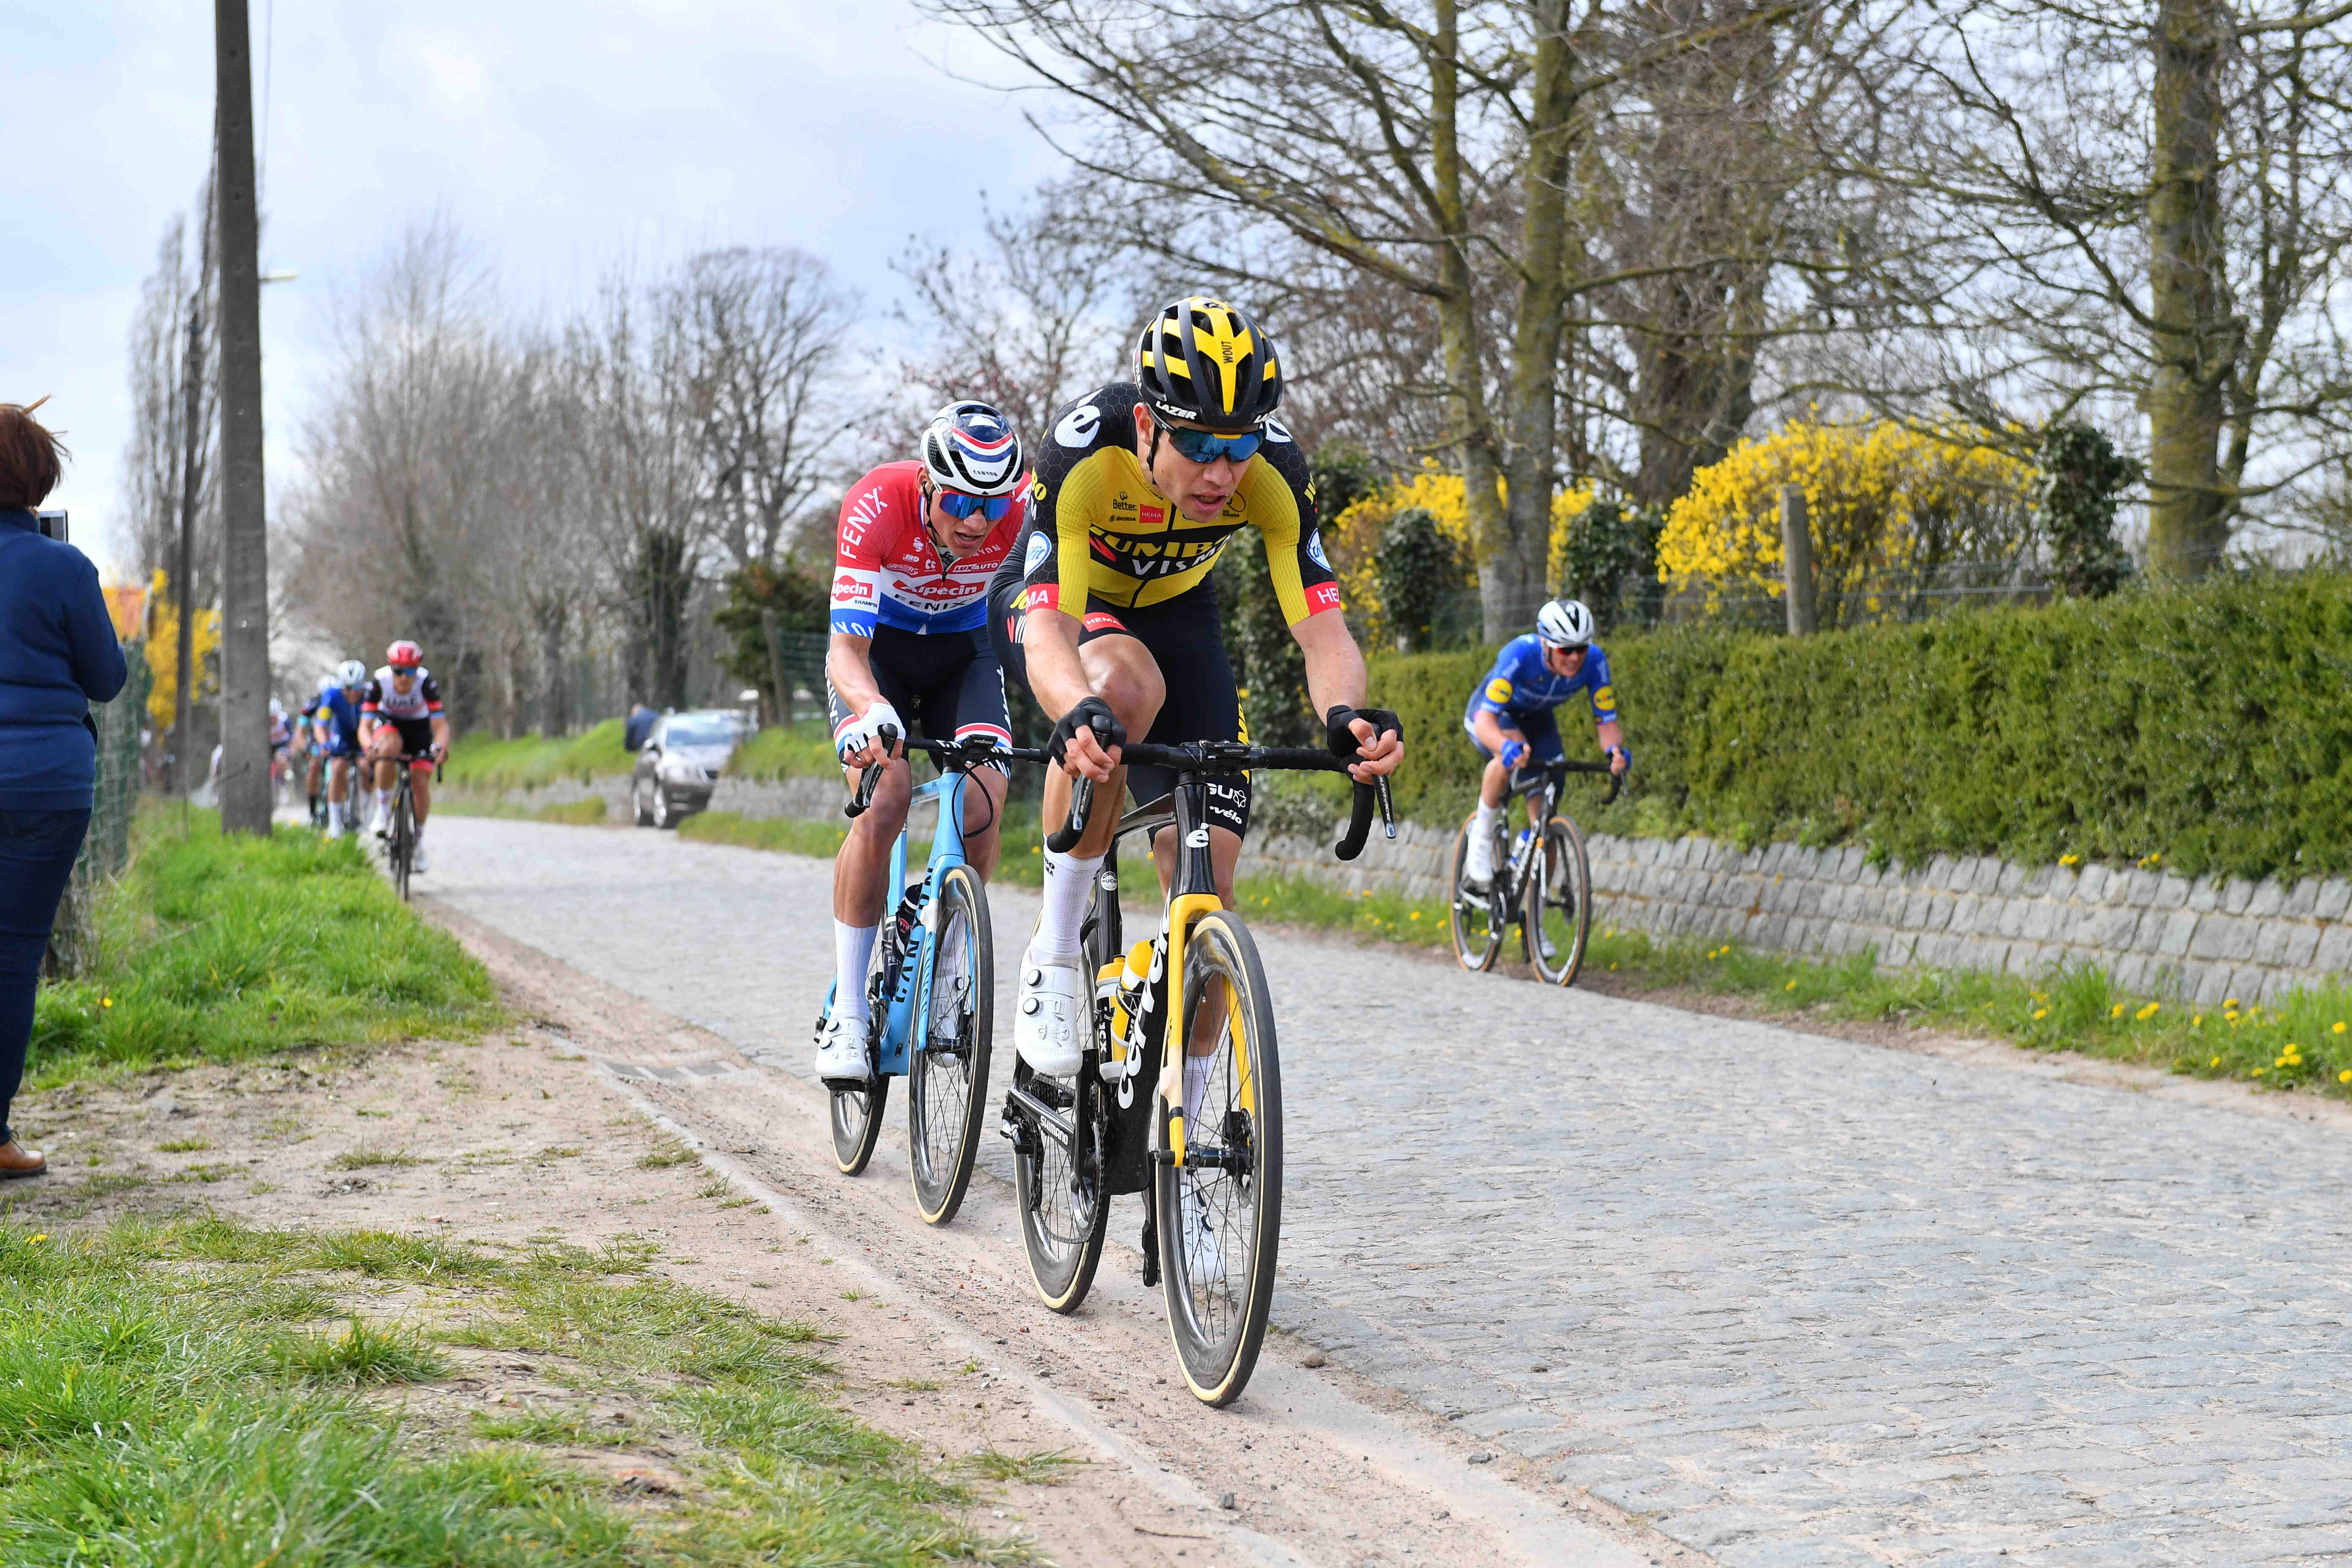 Šprinterska klasika Gent - Wevelgem pripadla van Aertu